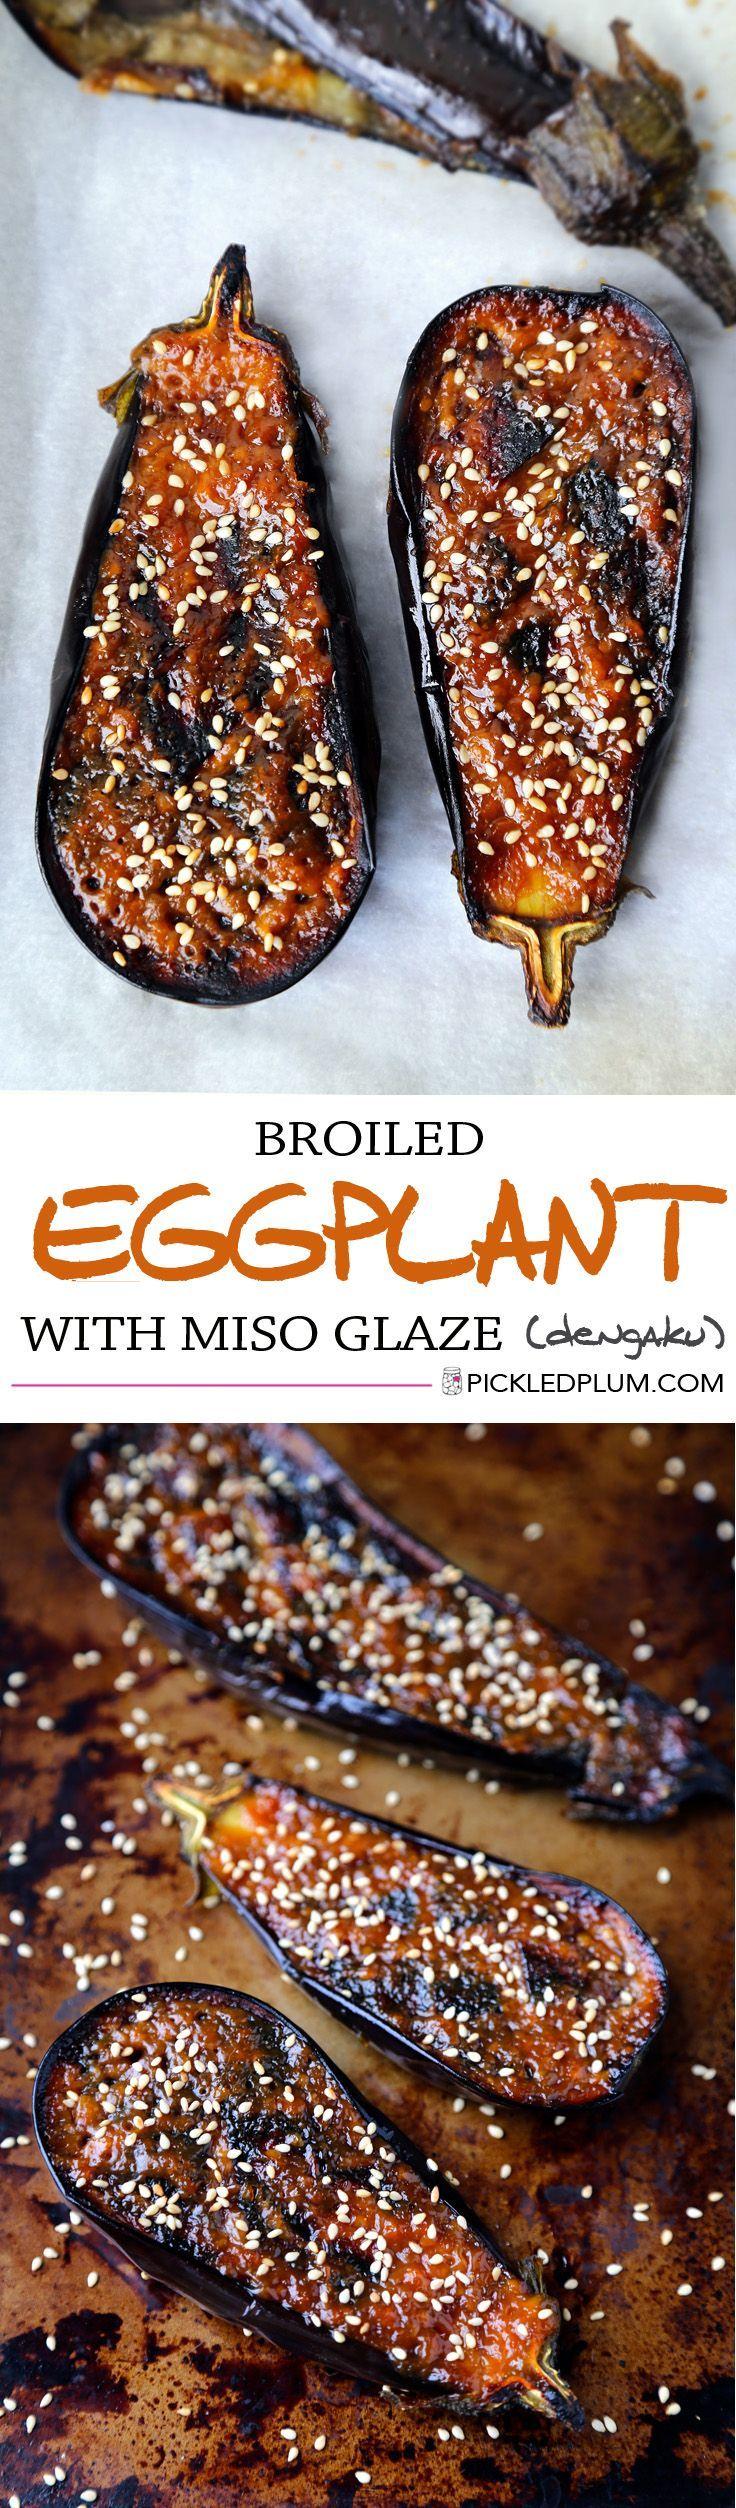 Nasu Dengaku Recipe - Japanese Broiled Eggplant with Miso Glaze - http://www.pickledplum.com/nasu-dengaku-recipe/